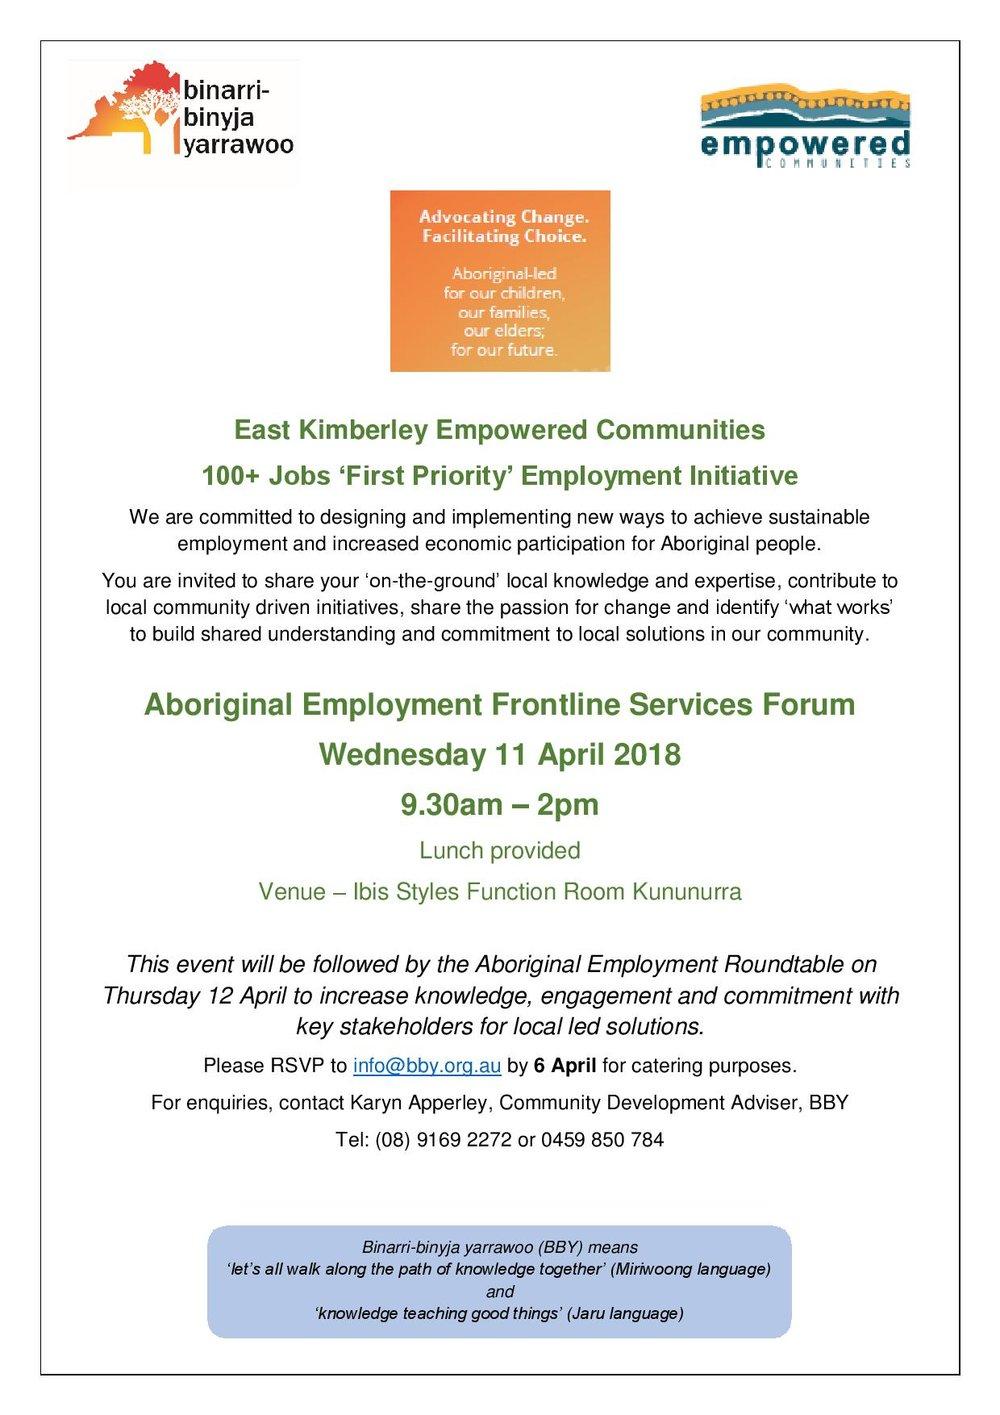 Invite - Frontline Services Forum 11-4-18-page-001.jpg